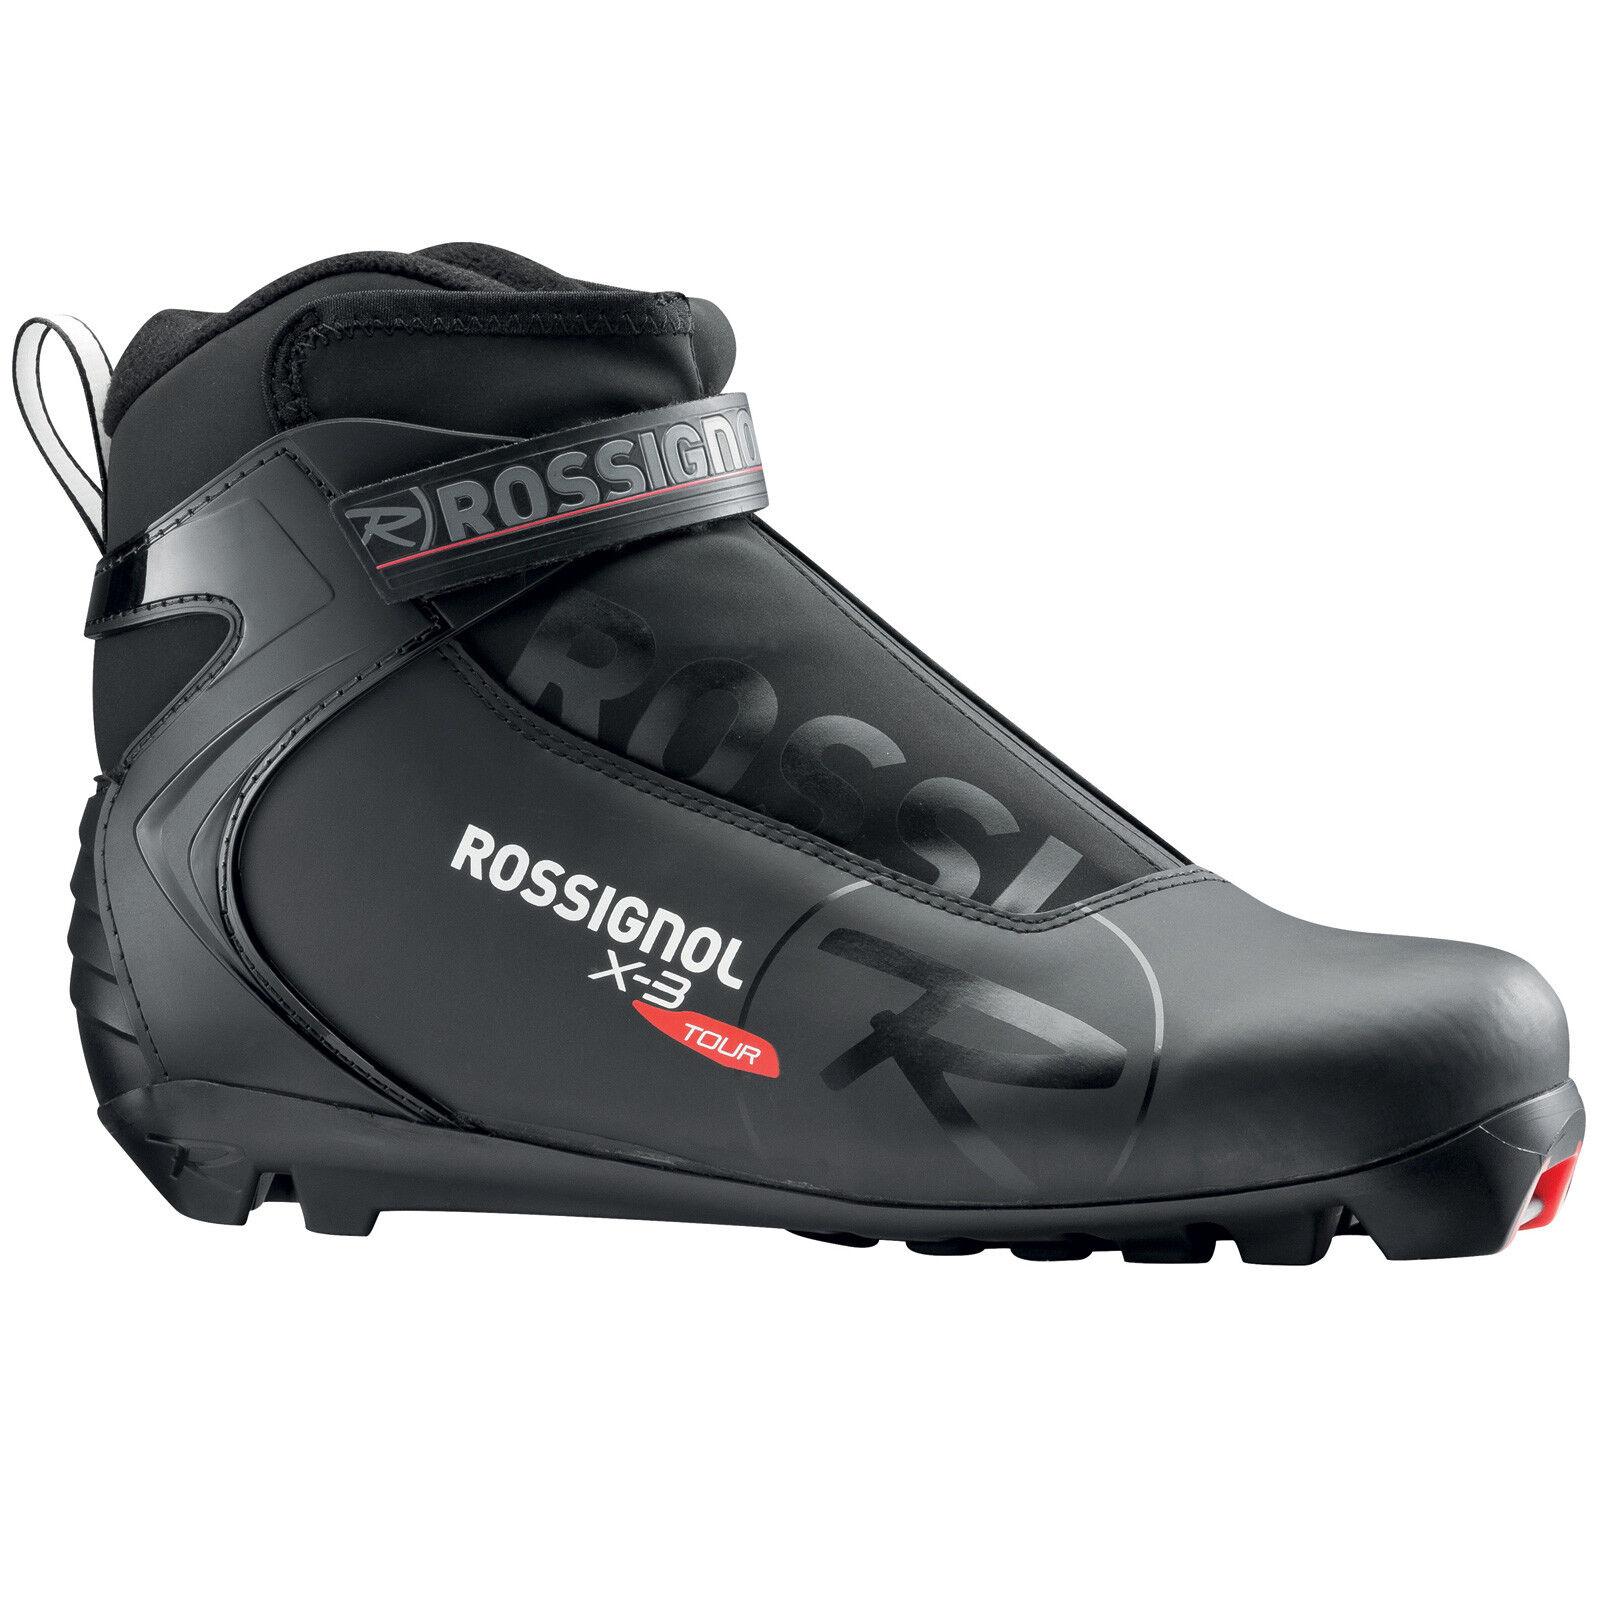 Rossignol X-3 Unisex Langlaufschuhe Classic Stil Touring Skischuhe Ski-boots NEU